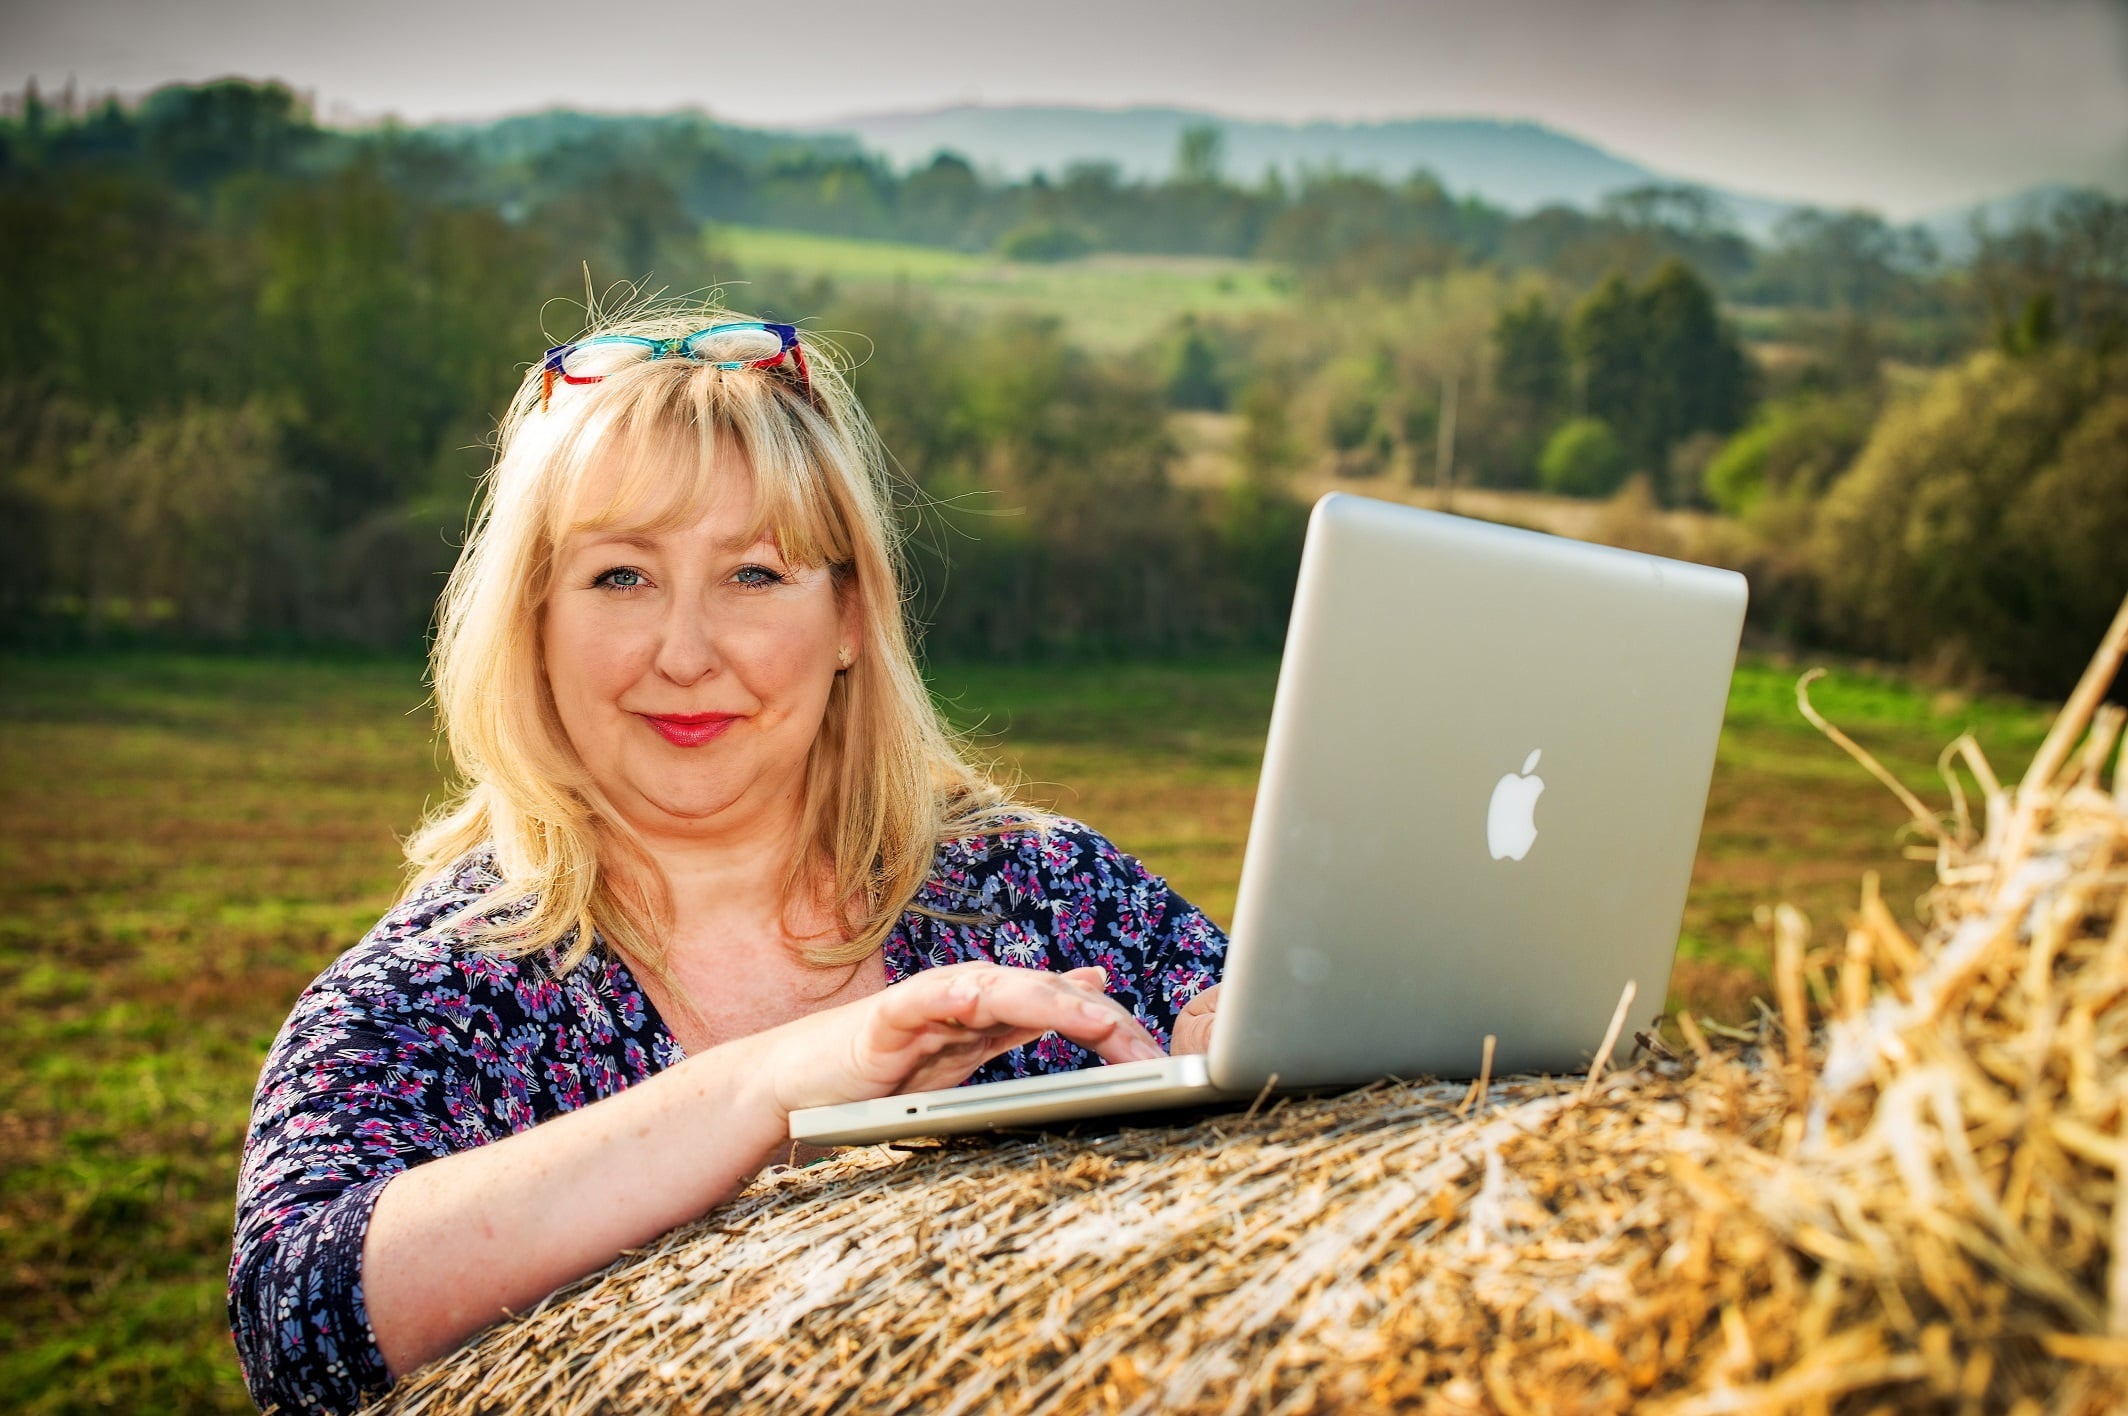 Meet The Team - WE EAT, SLEEP AND LIVE HEREFORDSHIRE - Heidi Eat Sleep Live Herefordshire